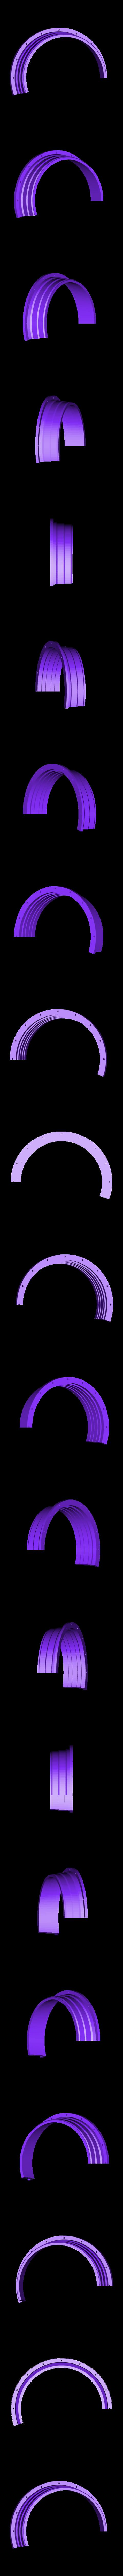 Turbine-Case201b.stl Download free STL file Turboprop Engine Modified Parts (No.2) • 3D printable design, konchan77